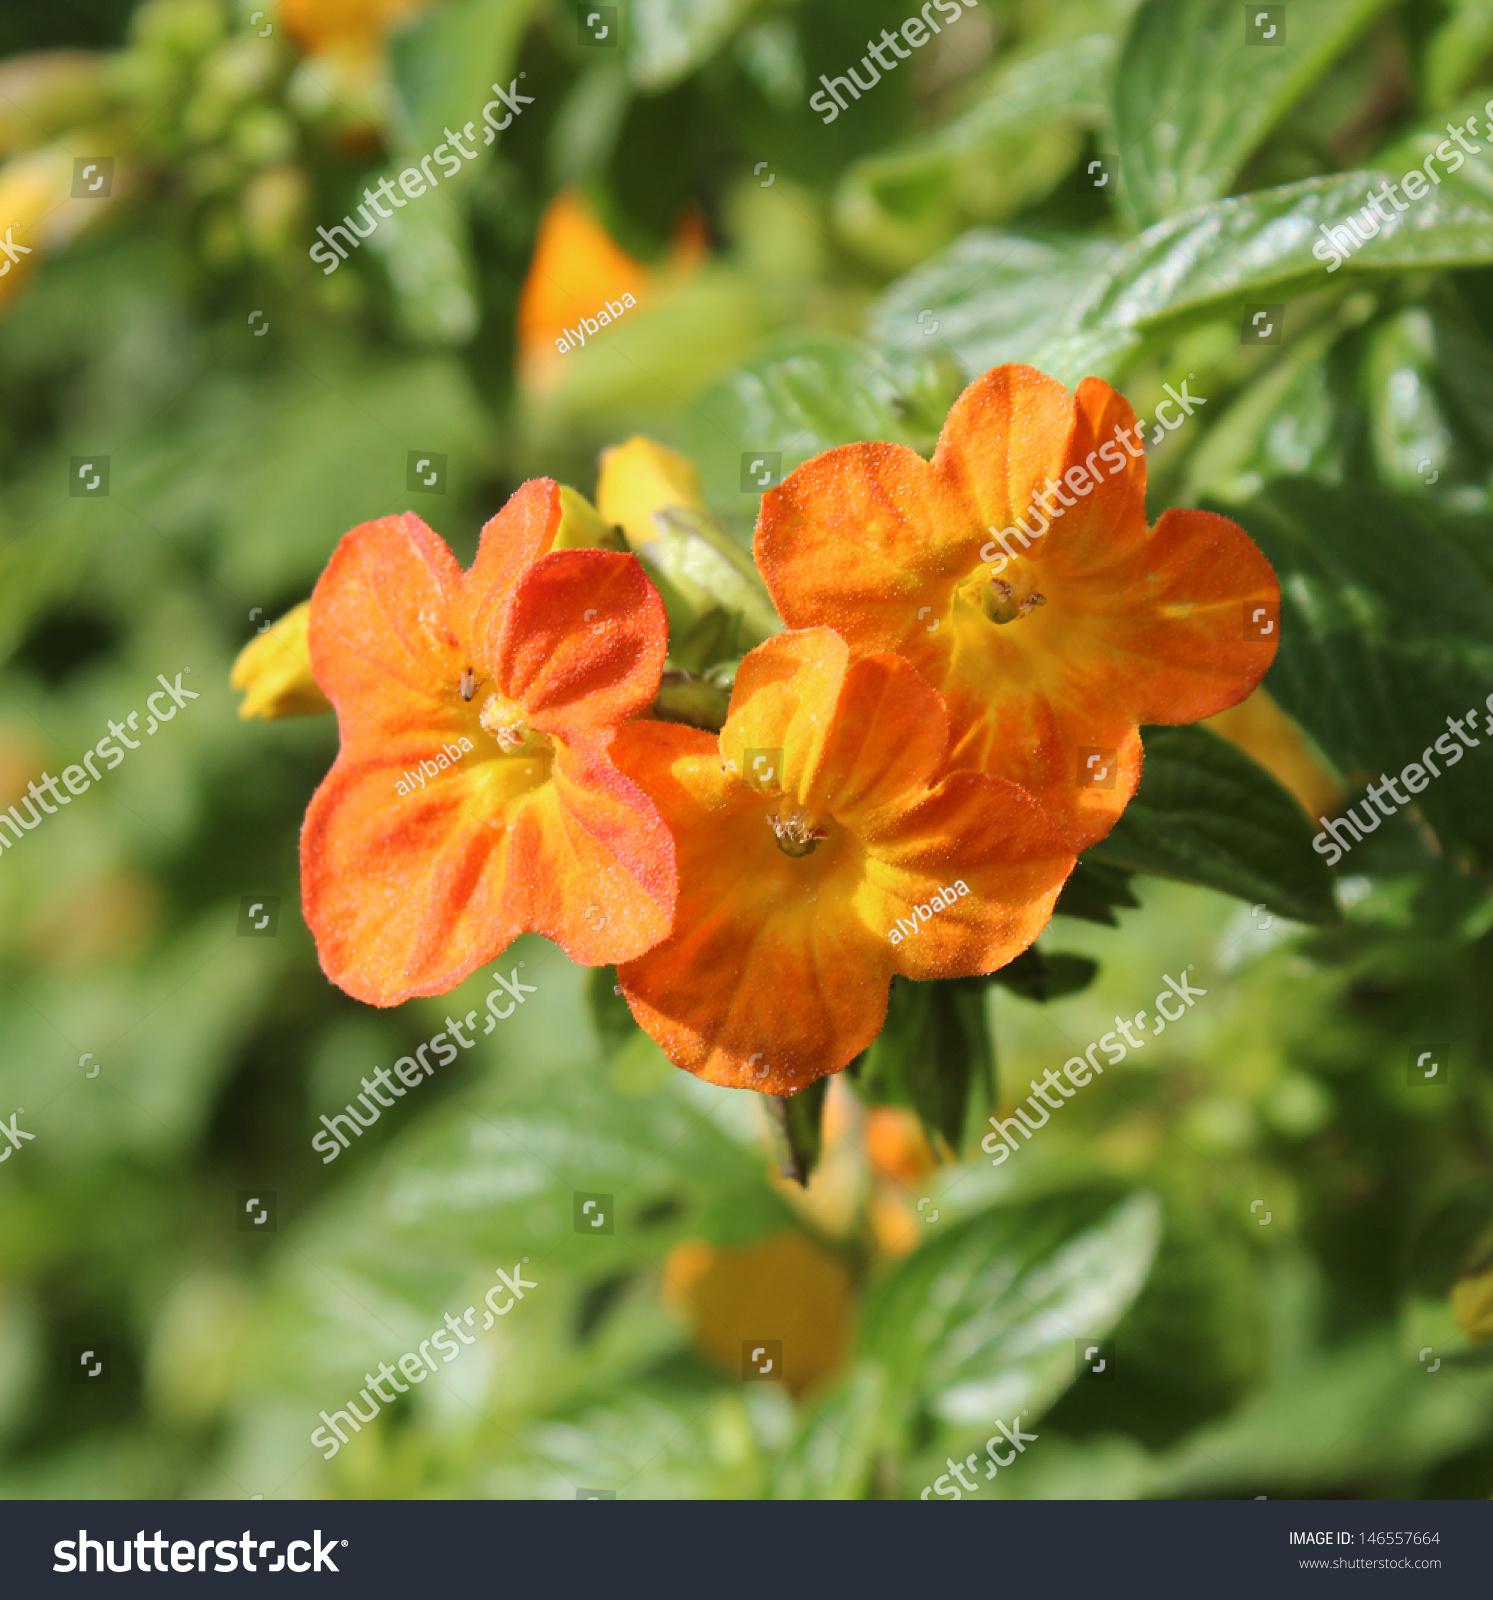 Beautiful Bright Flowers Streptosolen Jamesonii Marmalade Stock